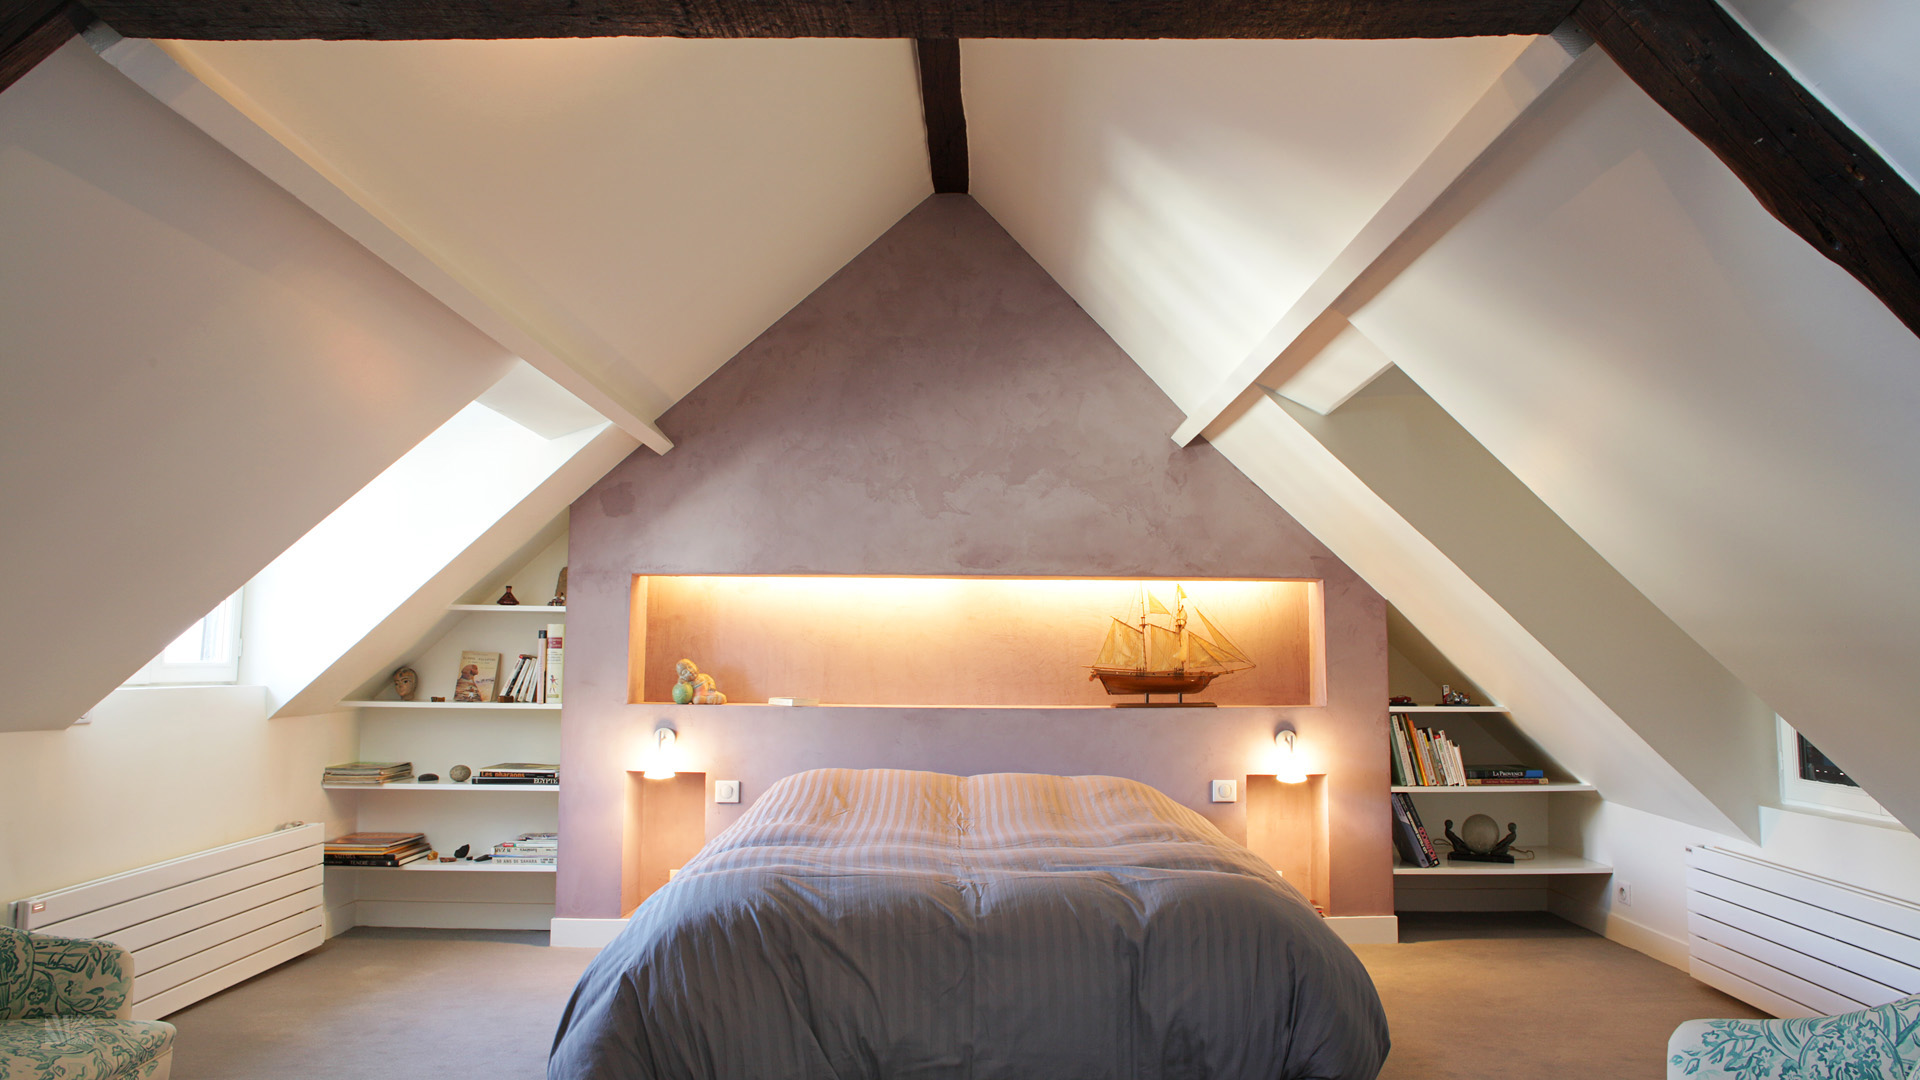 Charmant Chambre sous Les toits | Ravizh.com